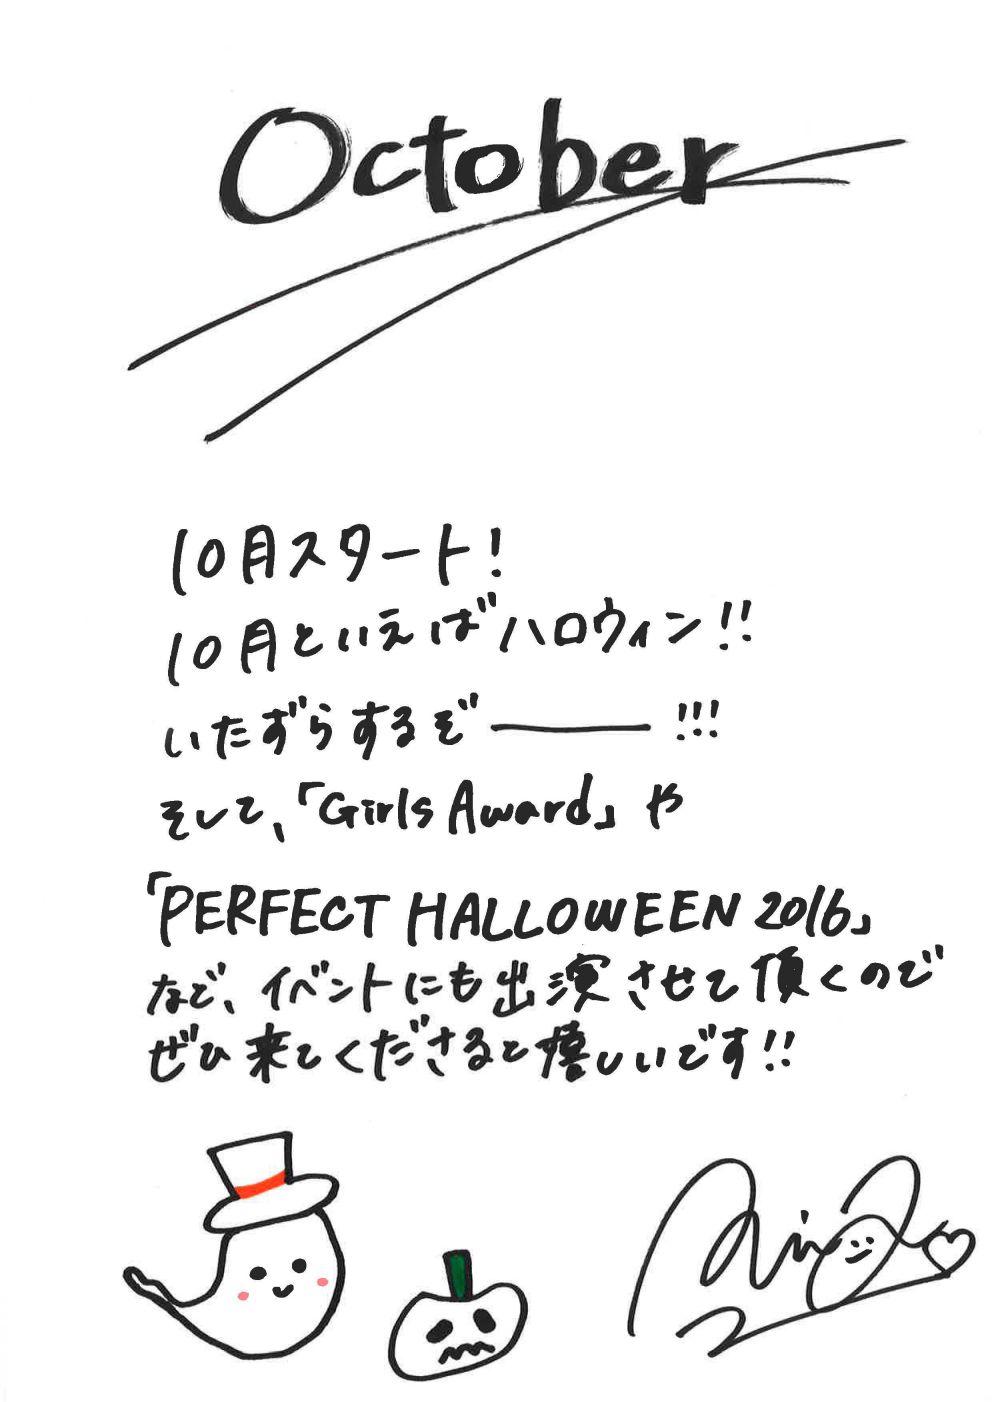 g201610_21_xykauab-4_jpg